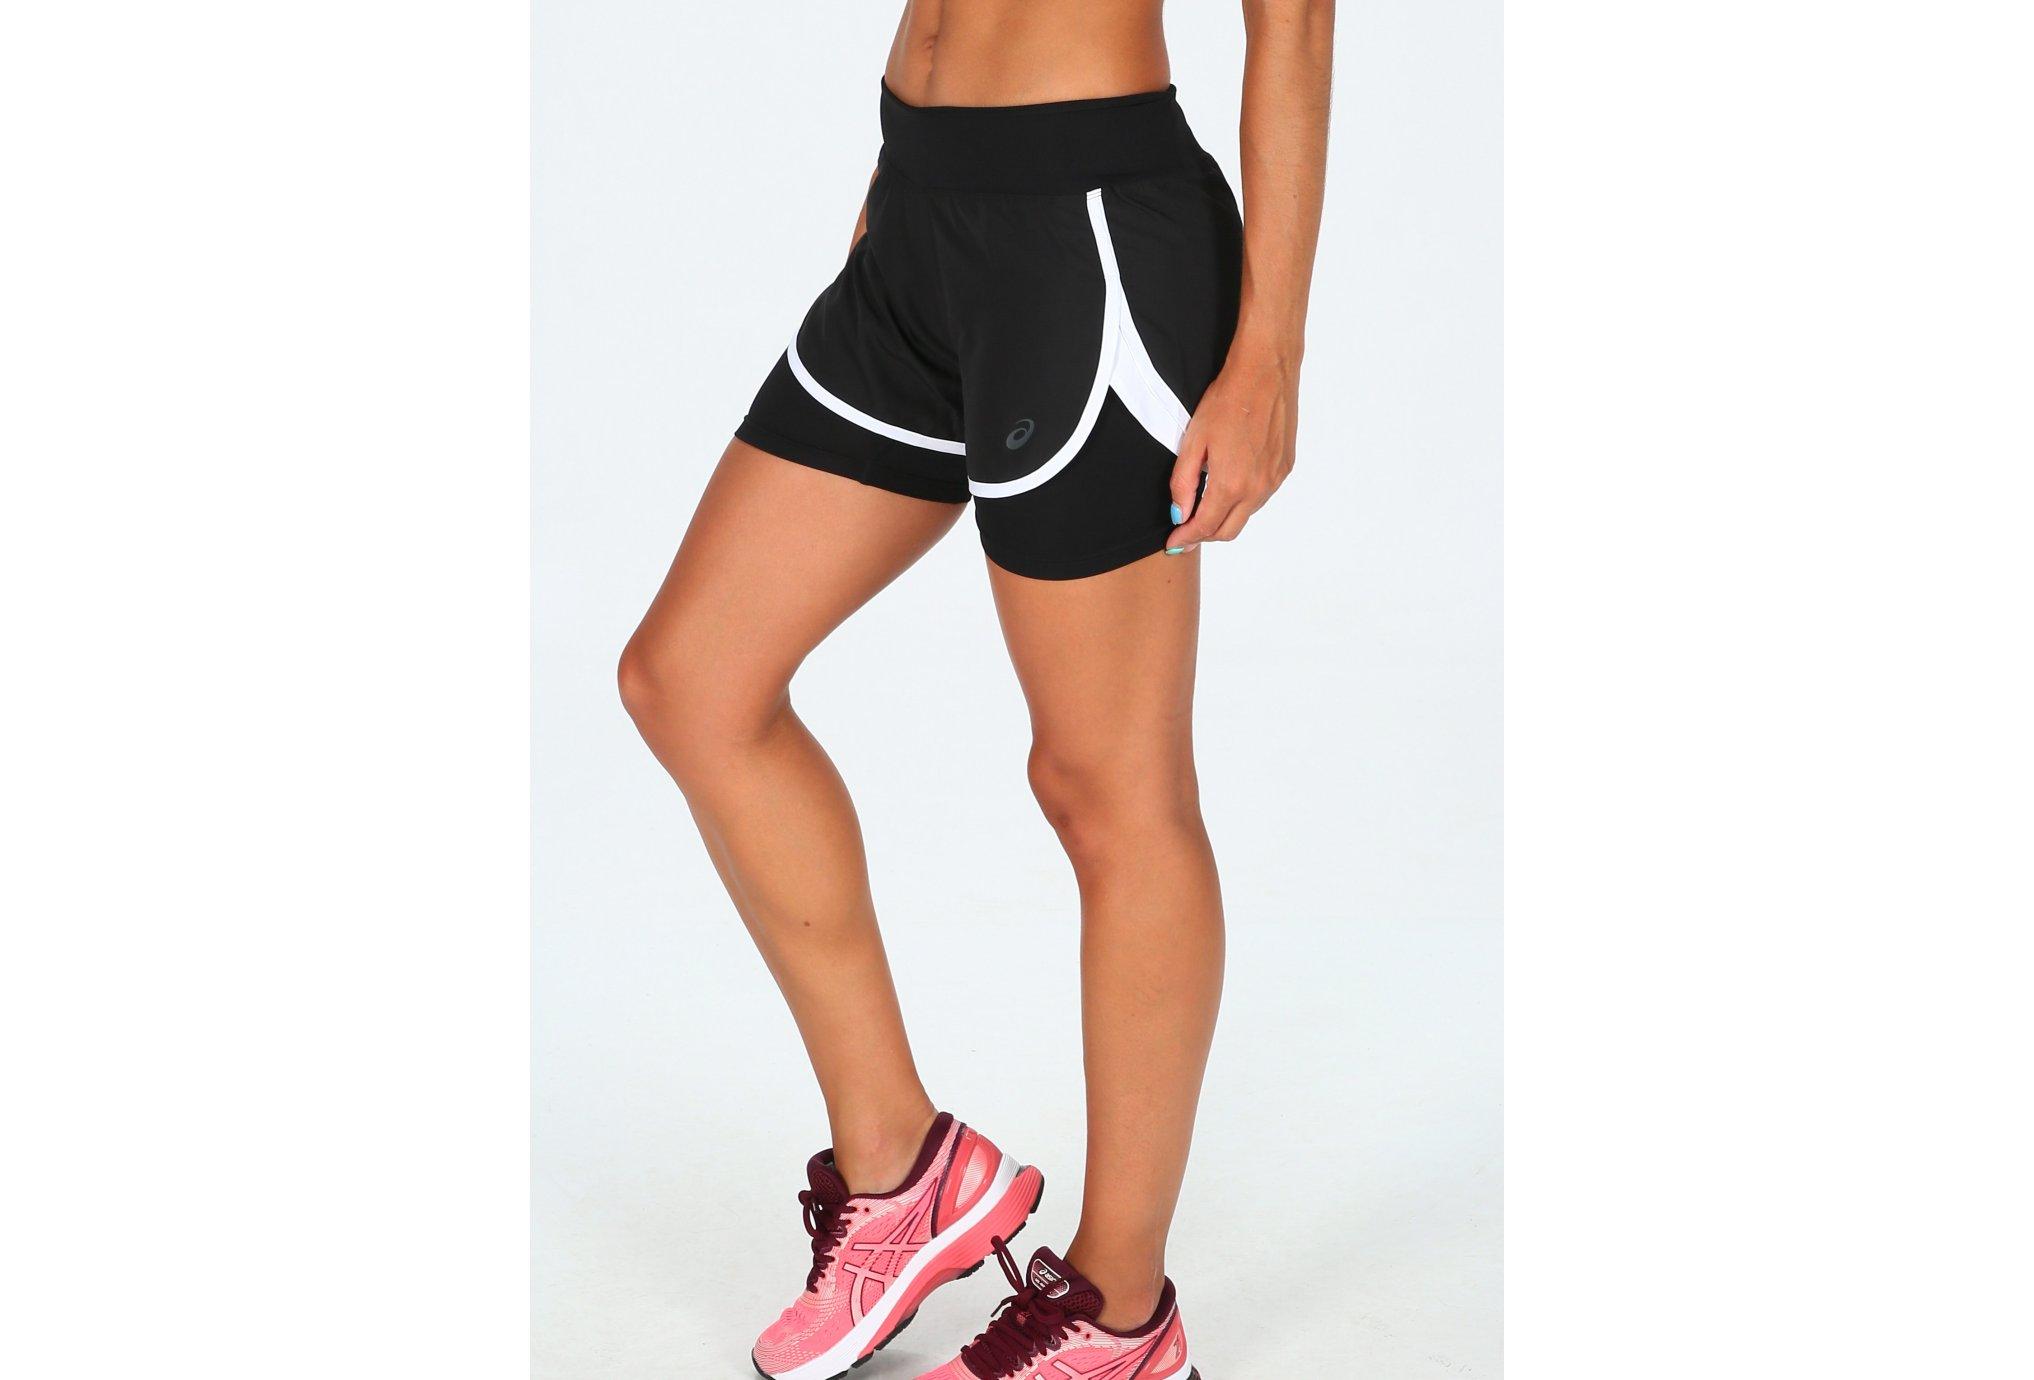 Asics 2 en 1 W vêtement running femme